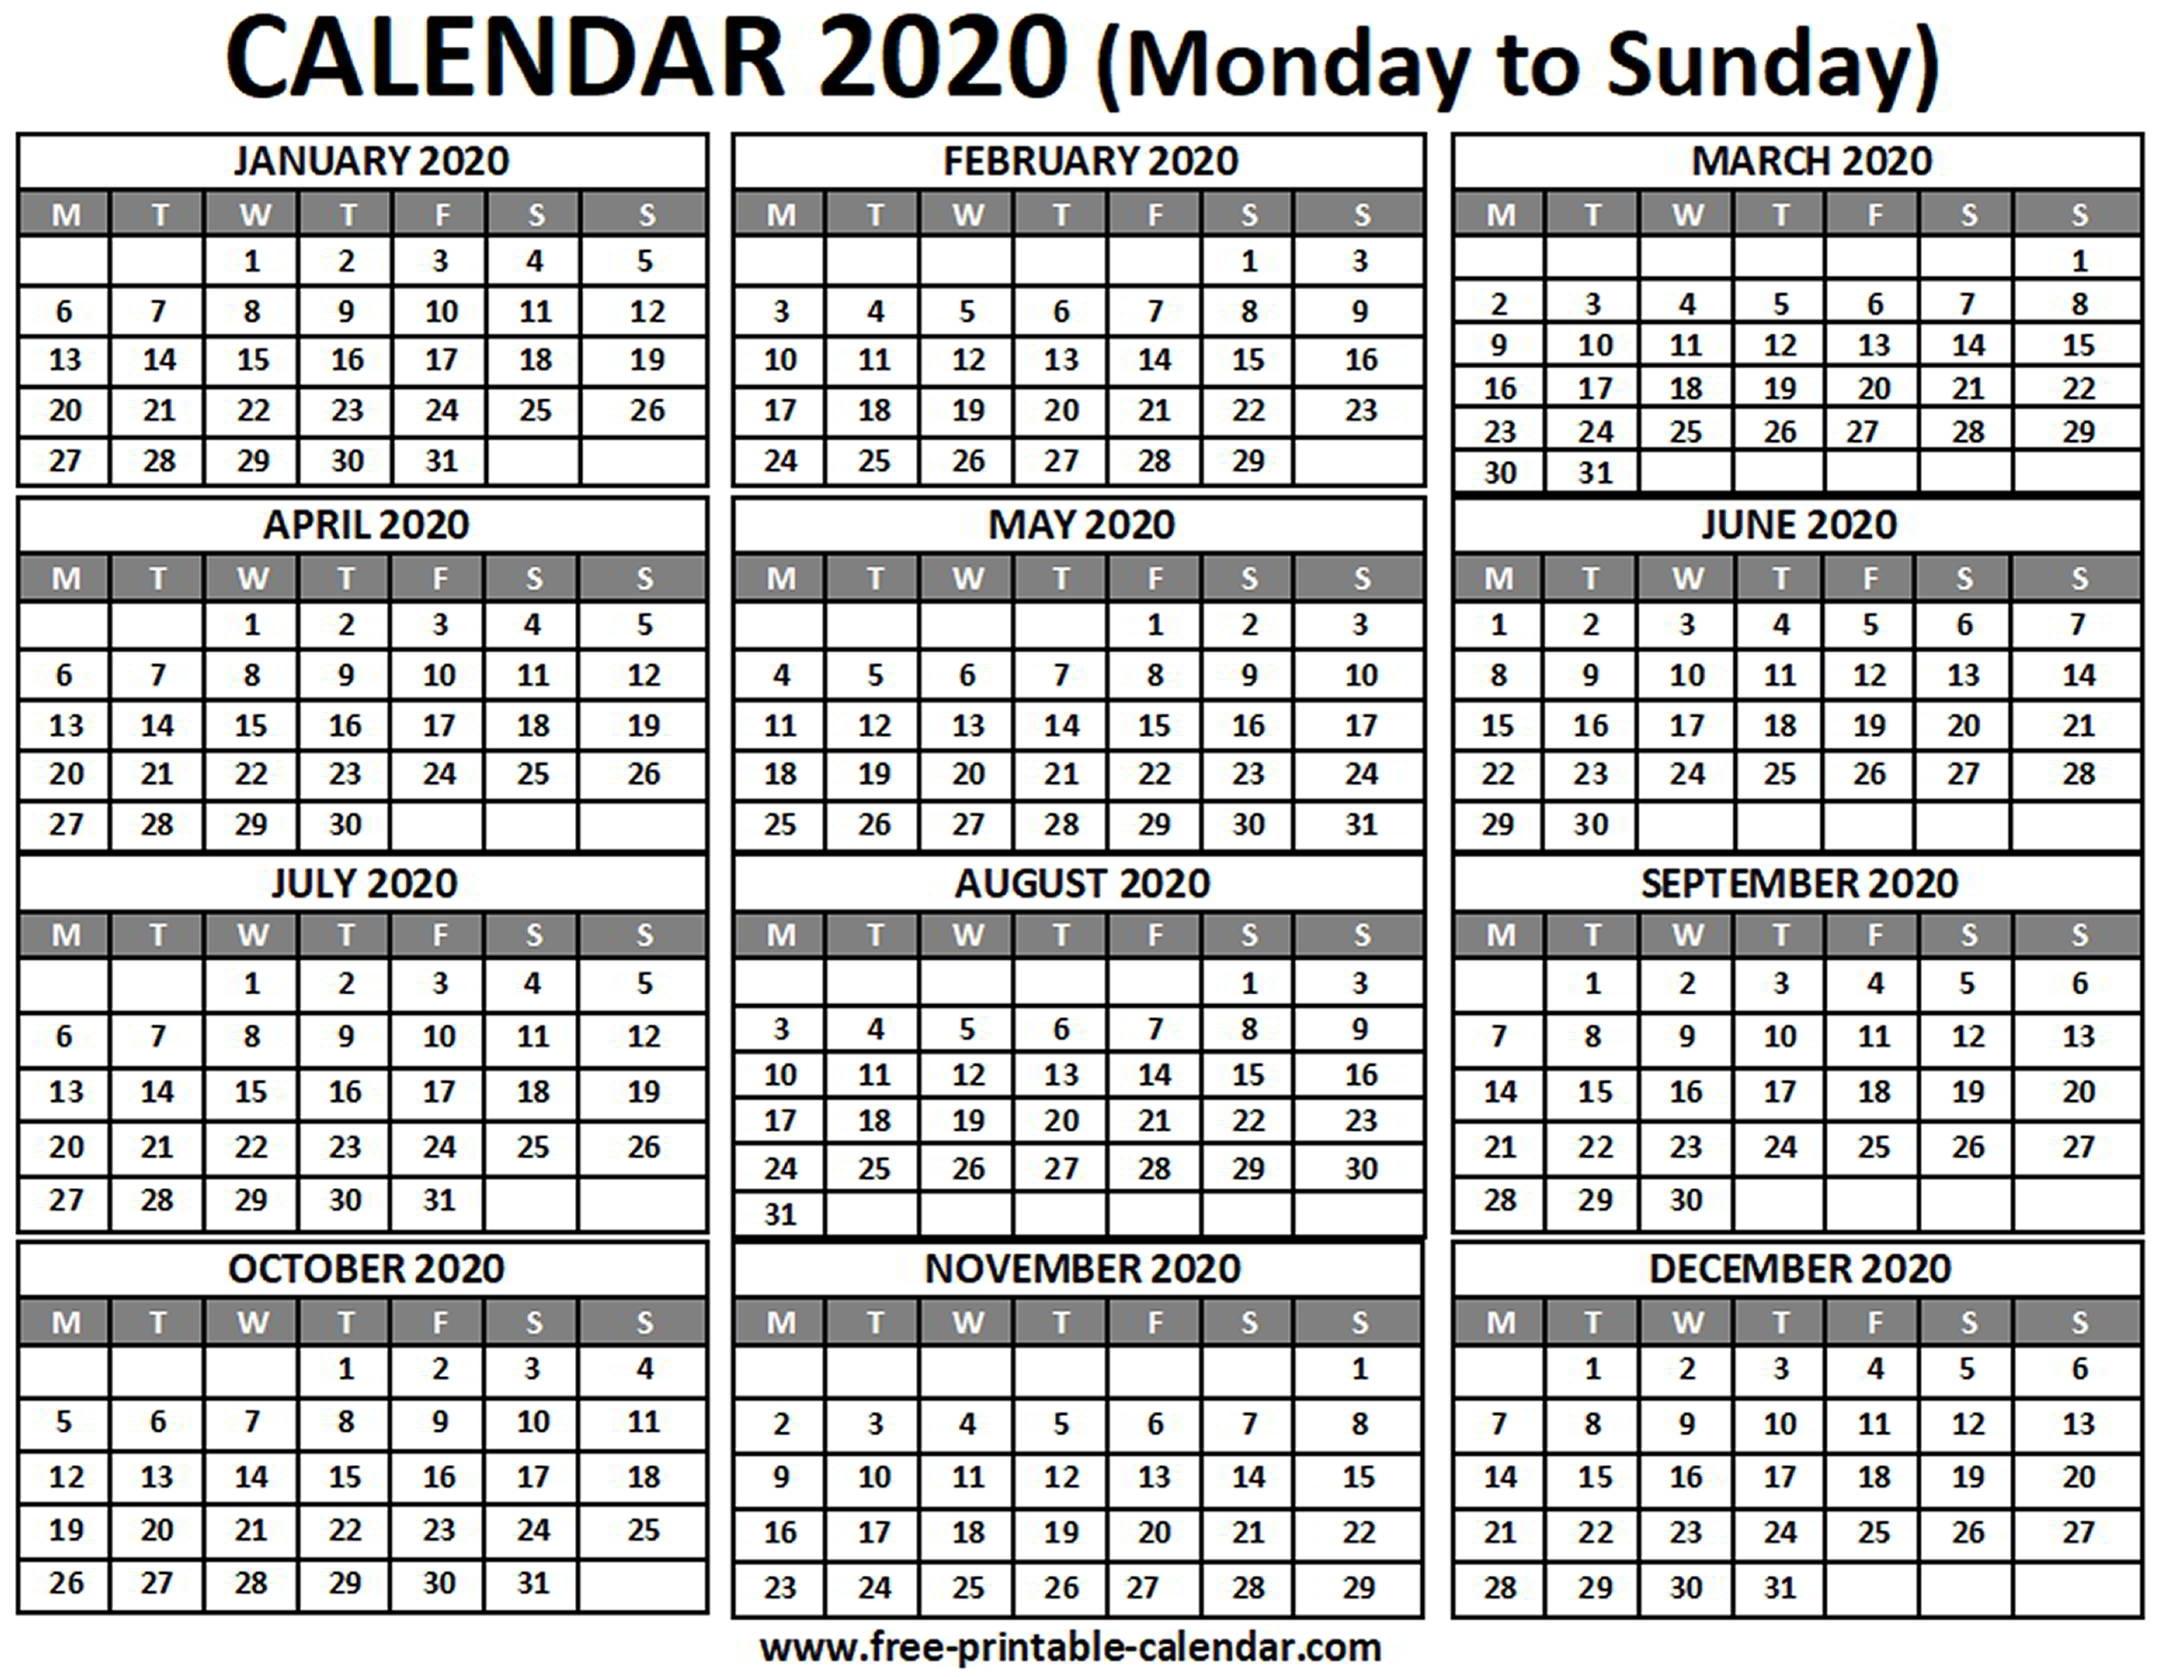 2020 Calendar - Free-Printable-Calendar for 2020 Printable Calendar Free That Start With Monday